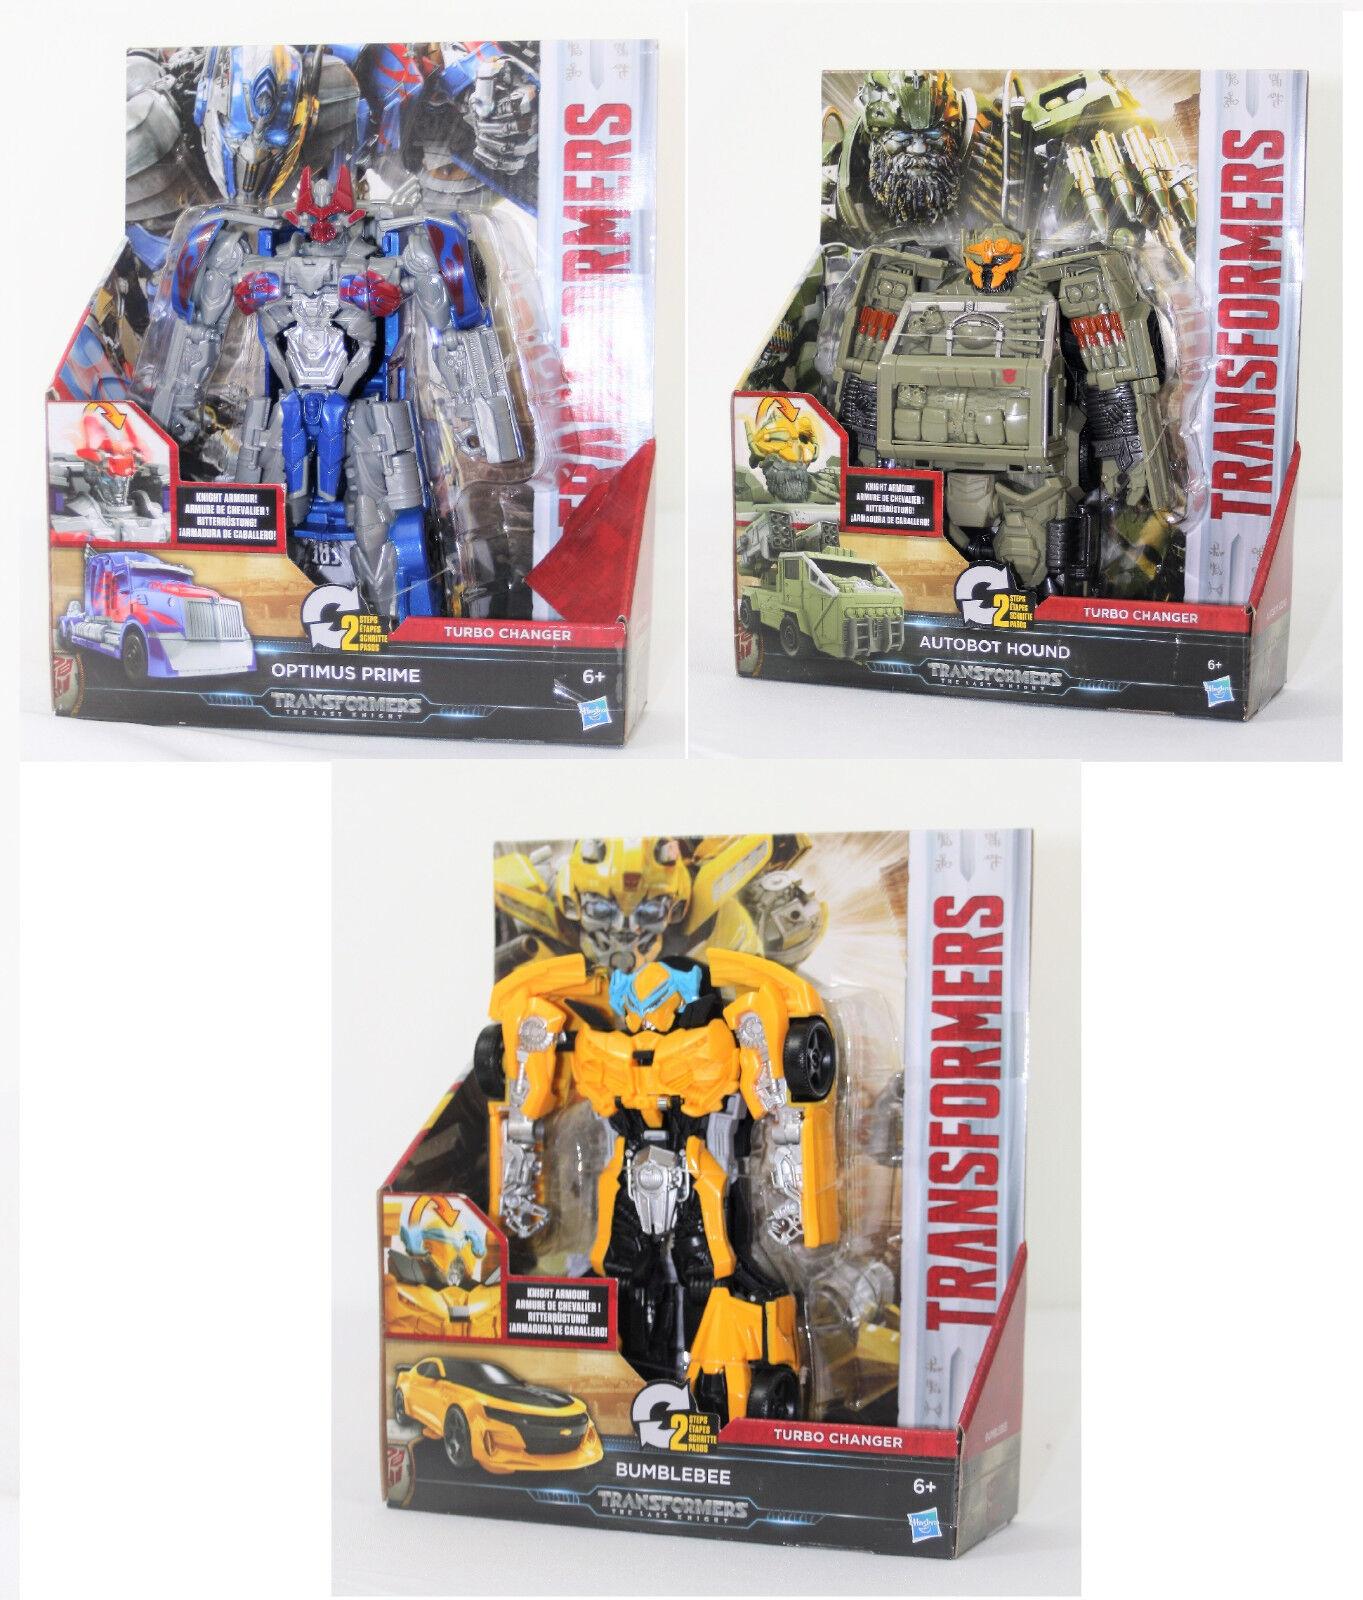 Transformers Turbo Changer, Bumblebee, Optimus Prime, Autobot Hound